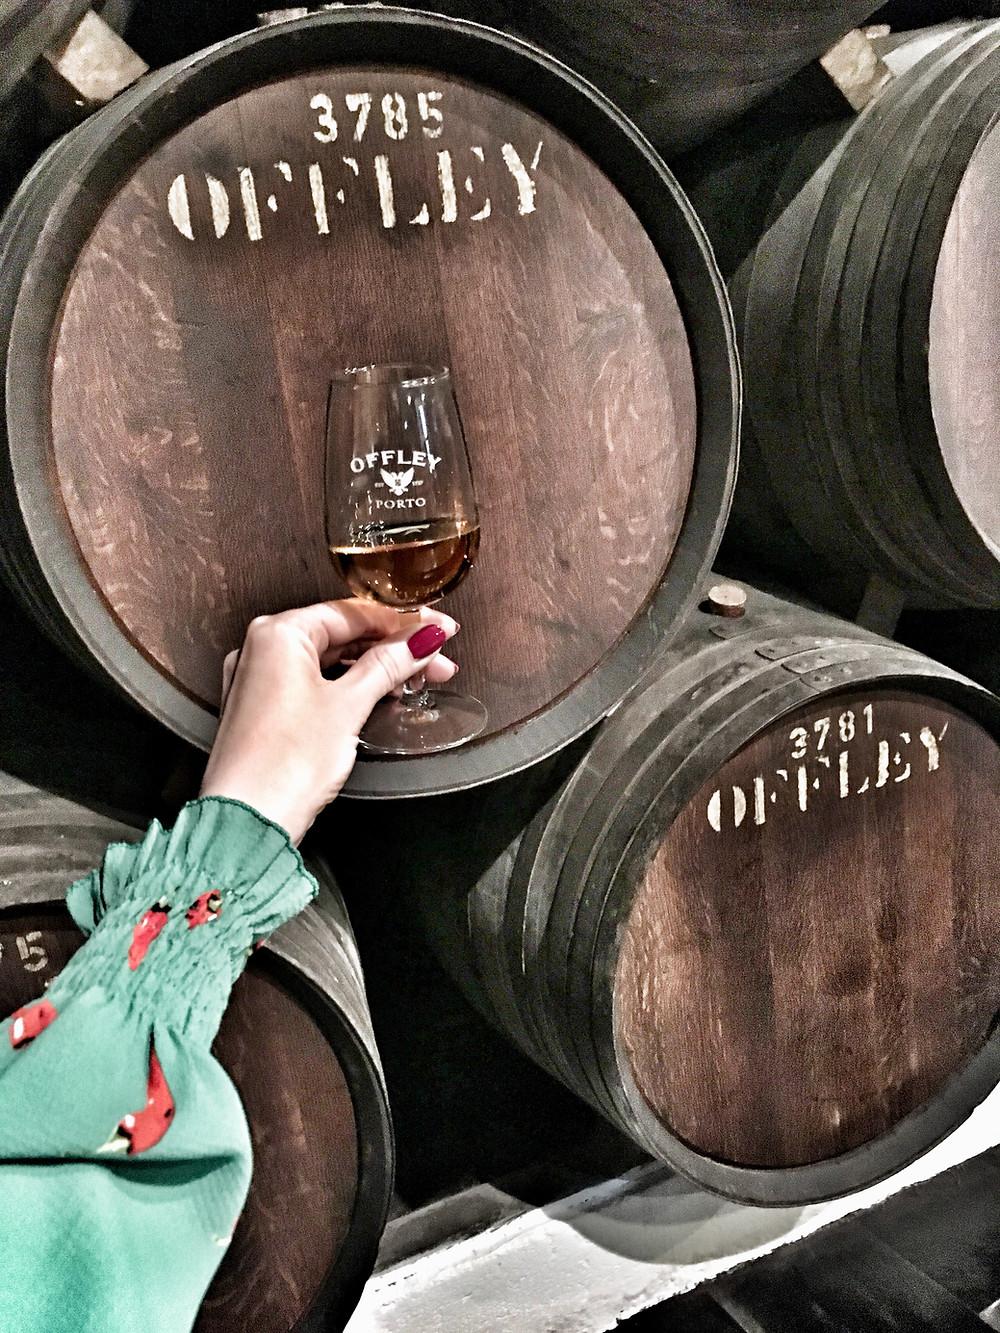 Port tasting at Offley Cellars in Porto